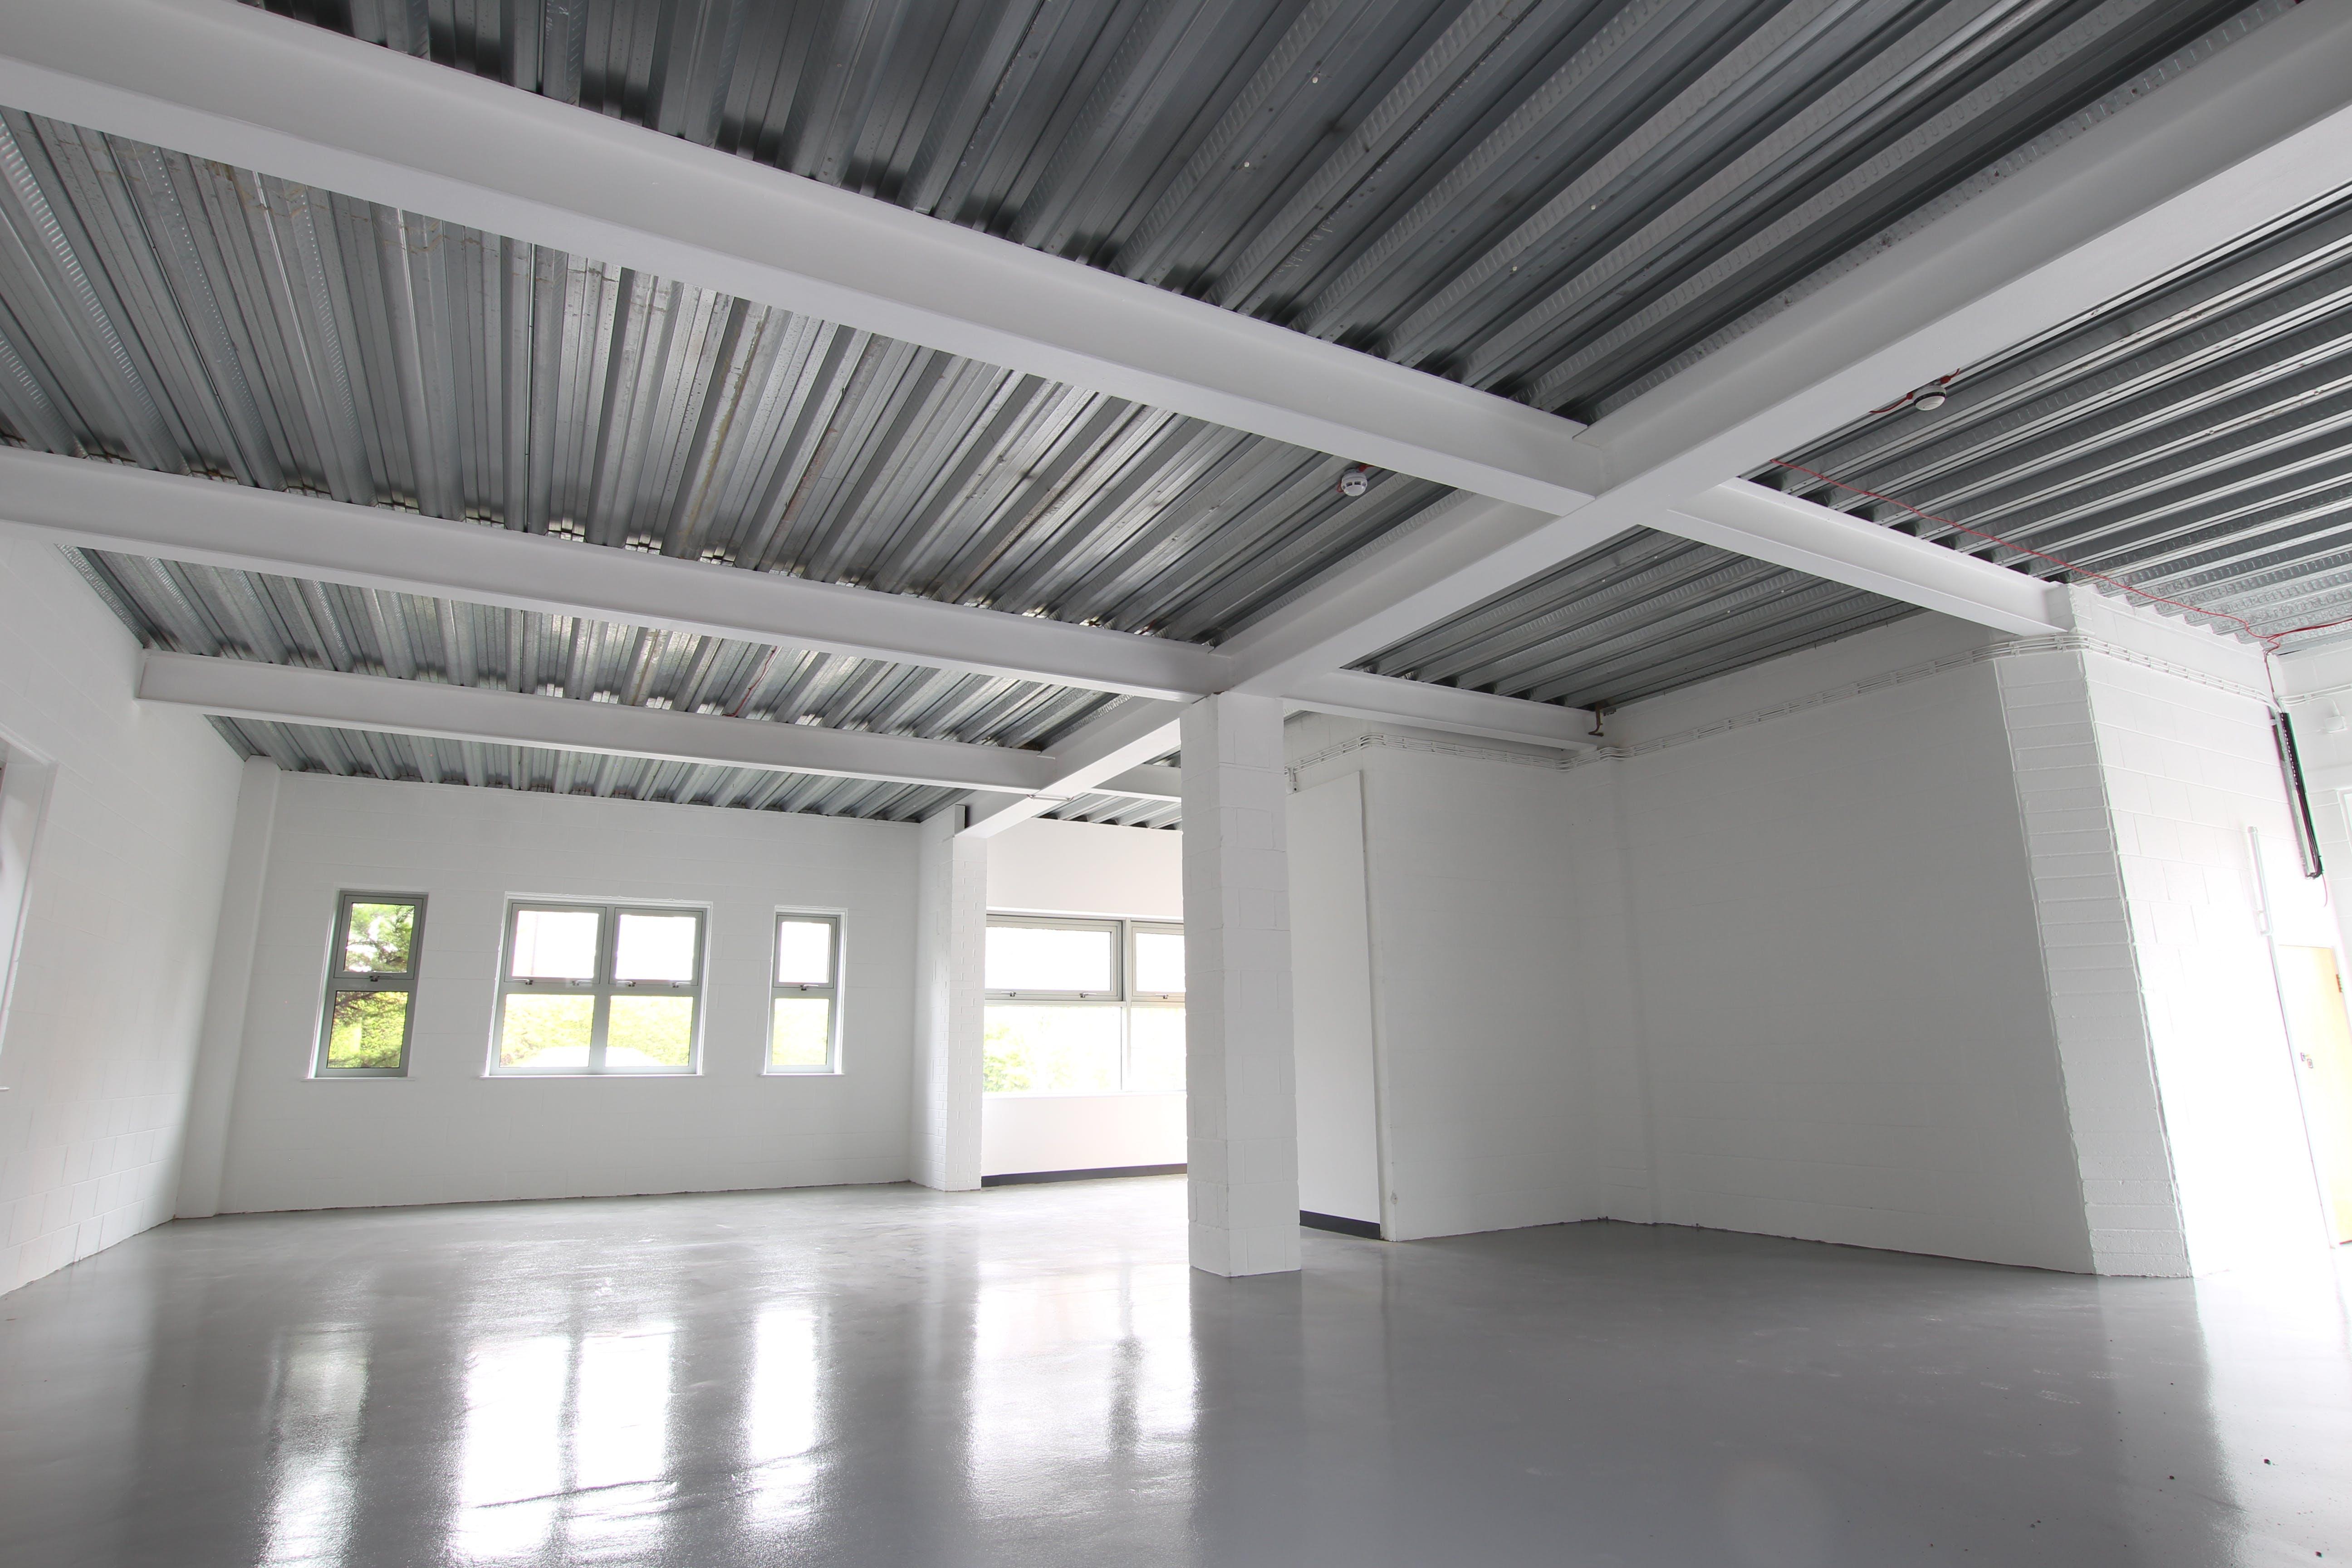 Unit 3 Bridge Court, Wrecclesham, Farnham, Offices / Warehouse & Industrial To Let - IMG_9046.JPG